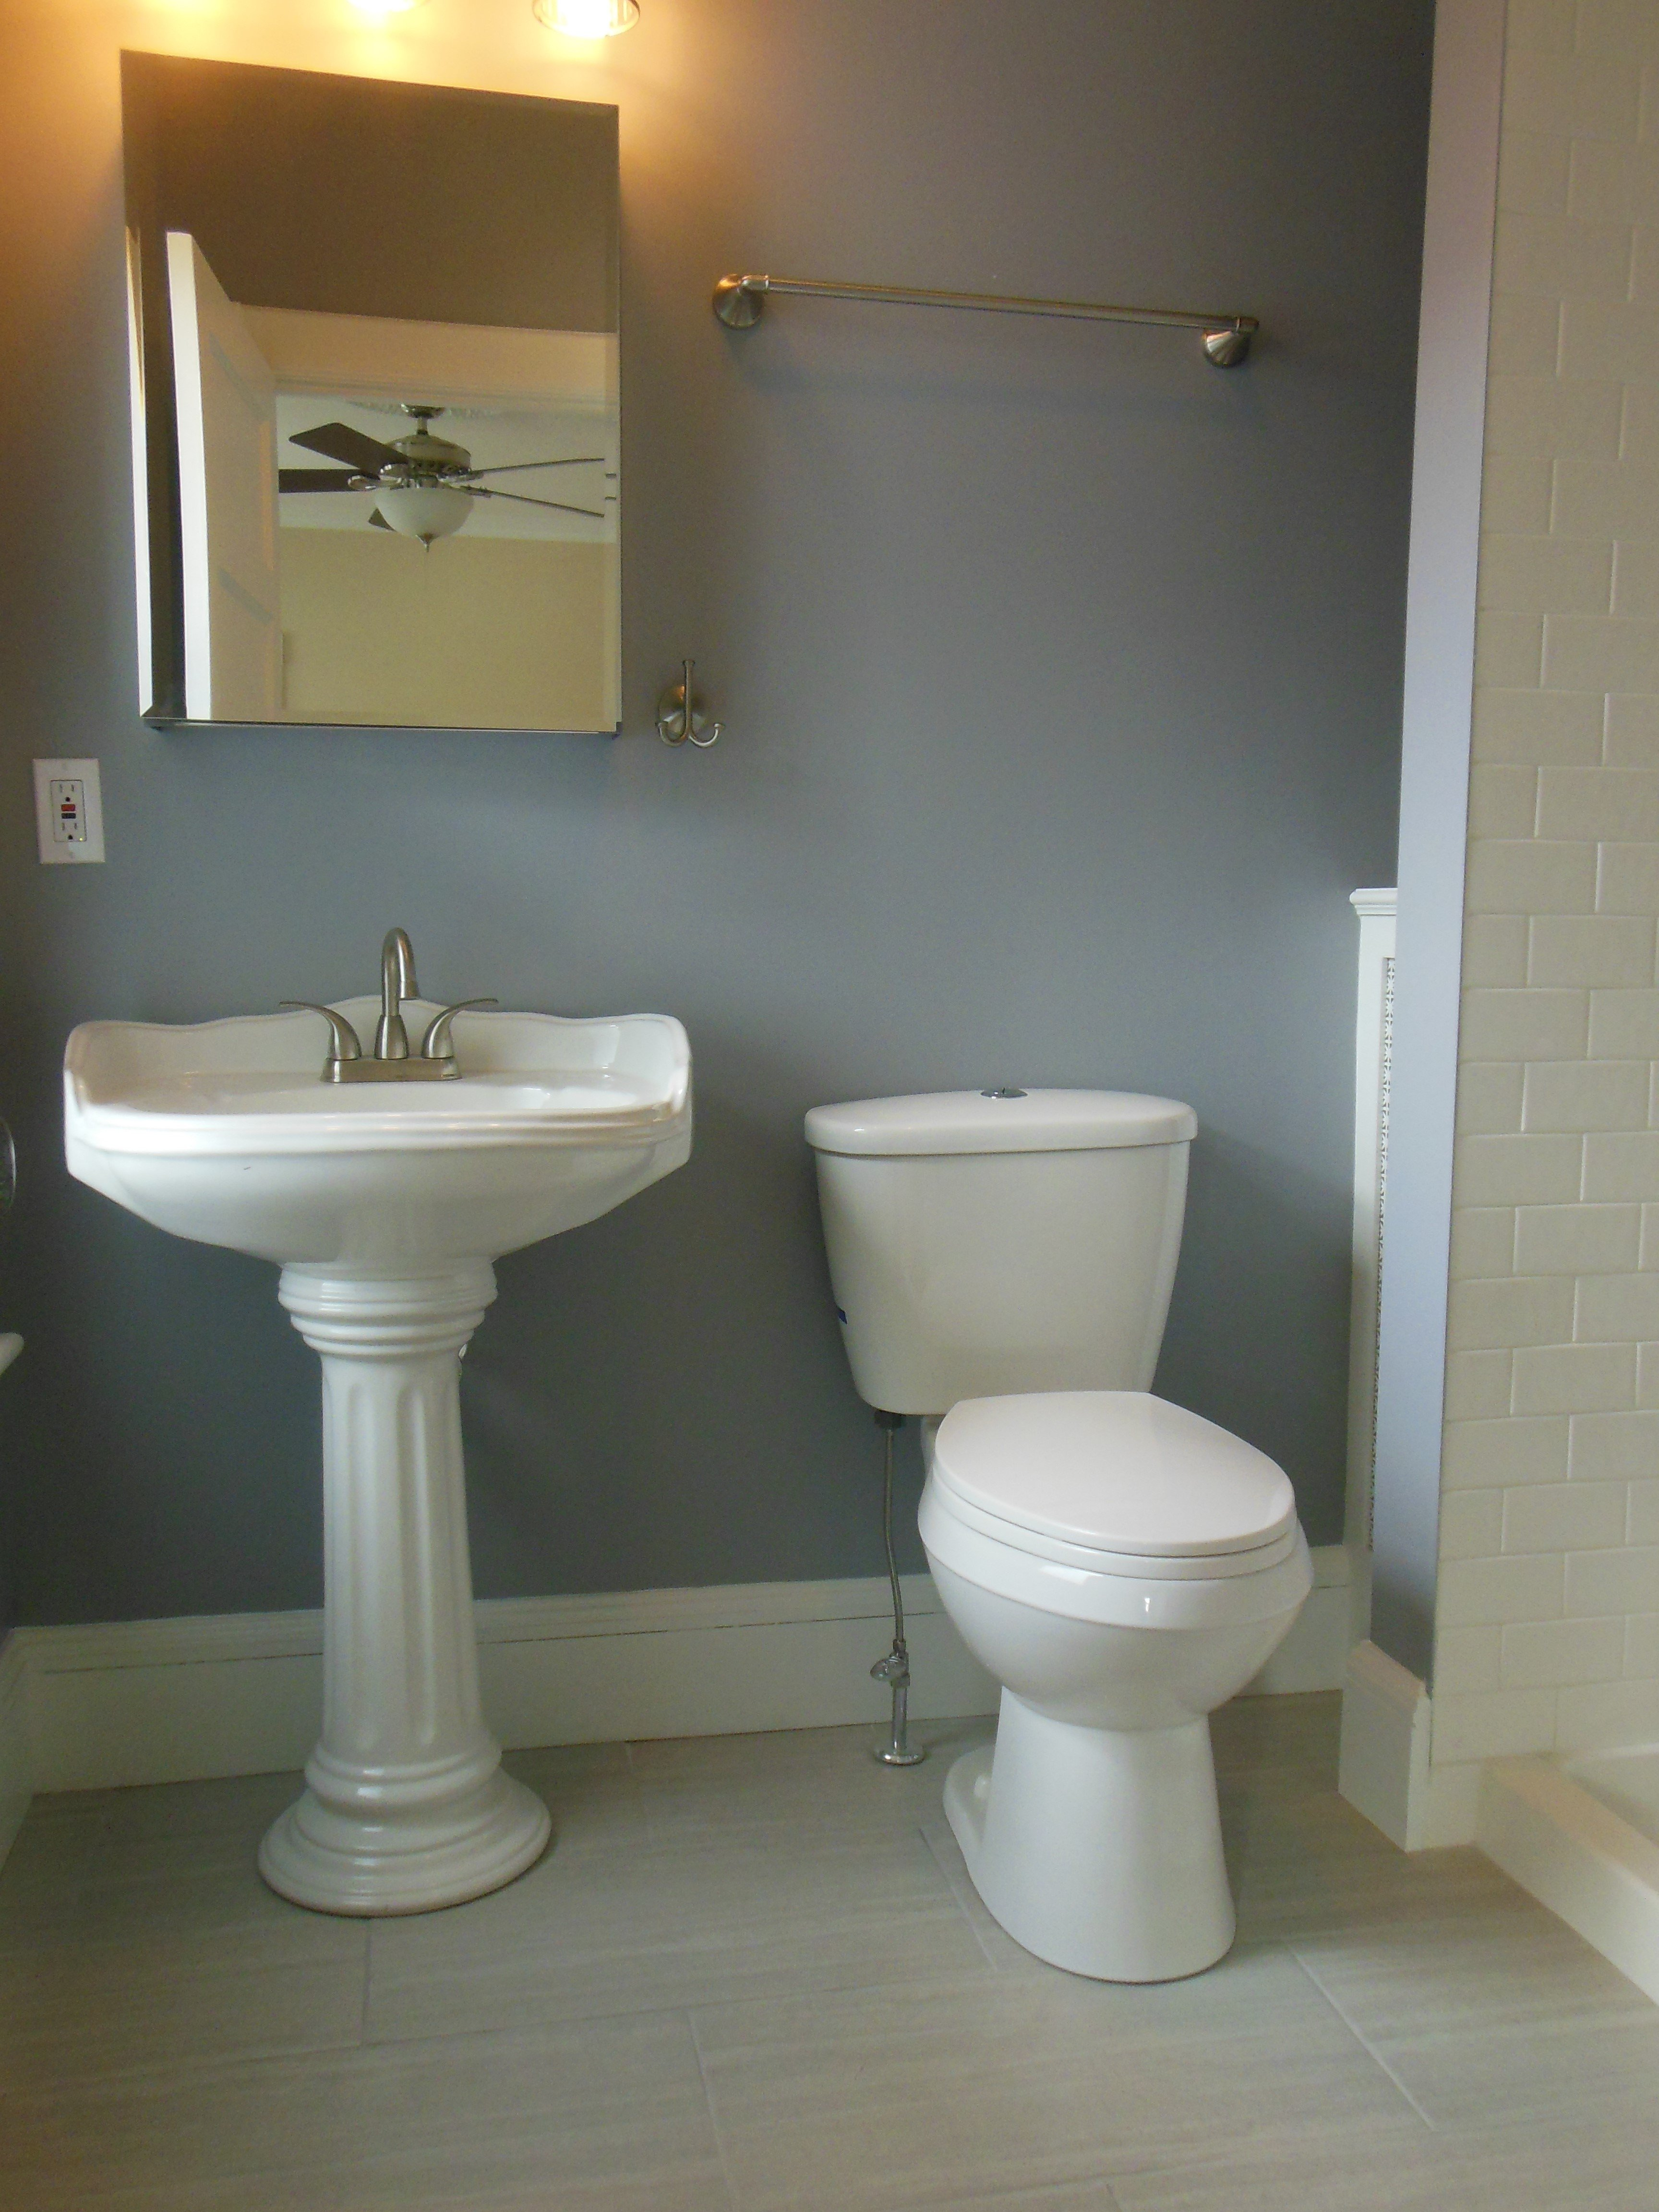 Bathroom Remodeling contractor West Hartford